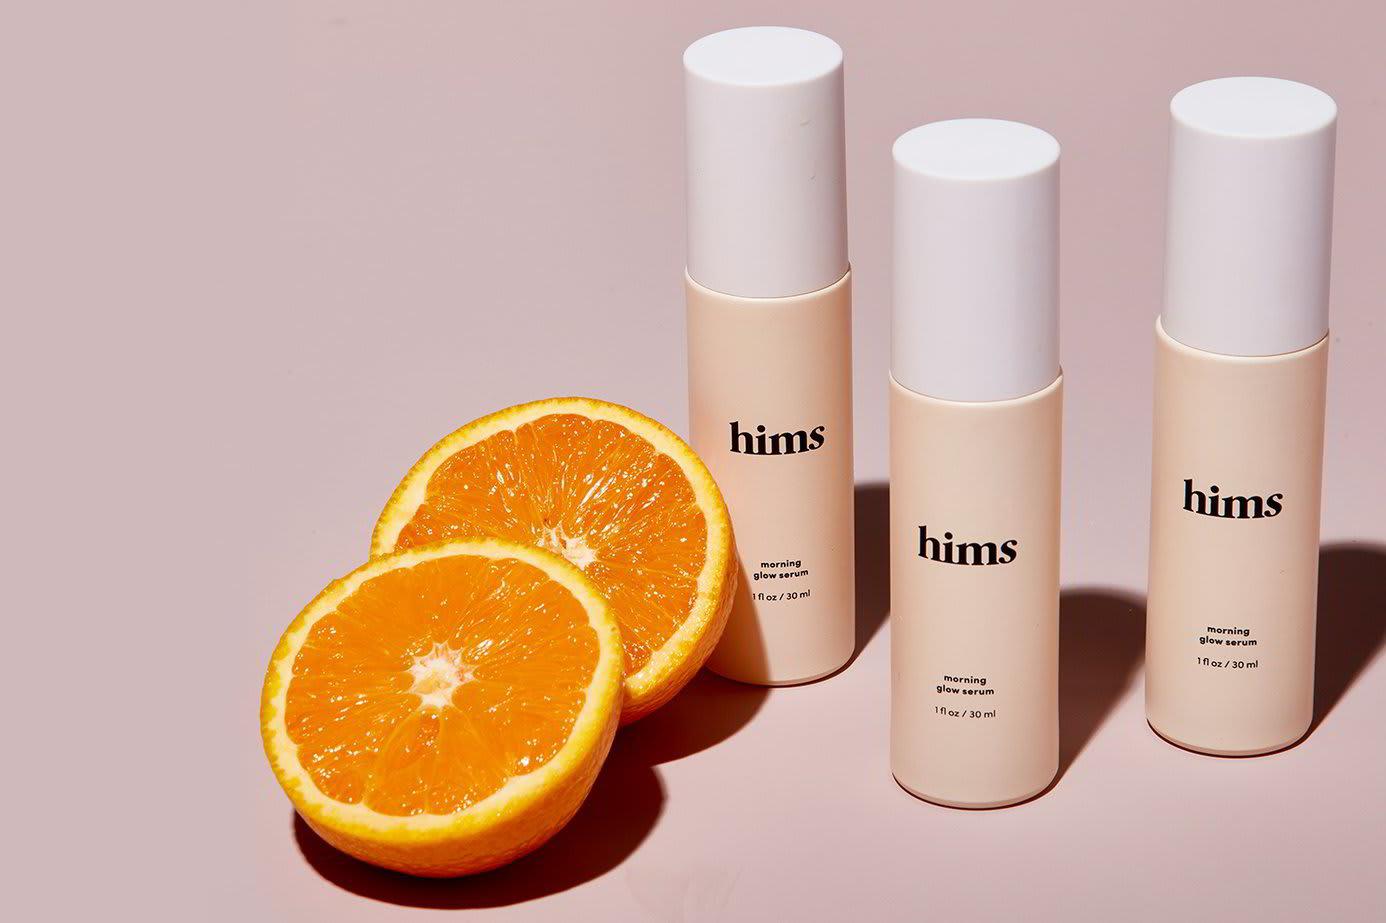 Many bottles of Hims Vitamin C Serum, accompanied by orange slices